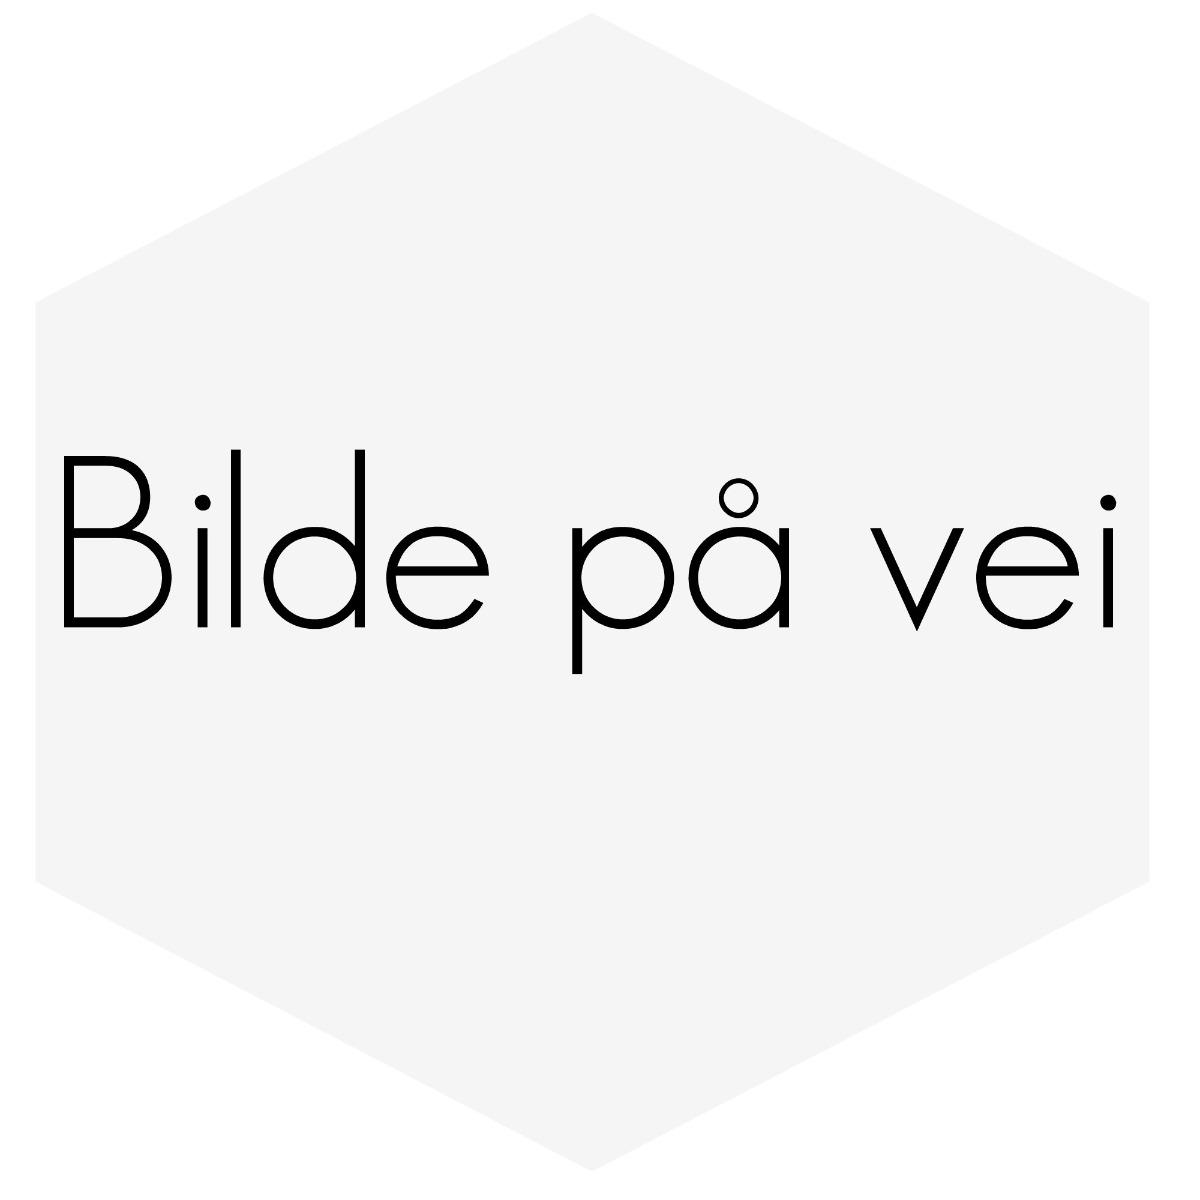 FILTER-JR SPORT INNSATS TIL BLA.: DIV. VW/AUDI